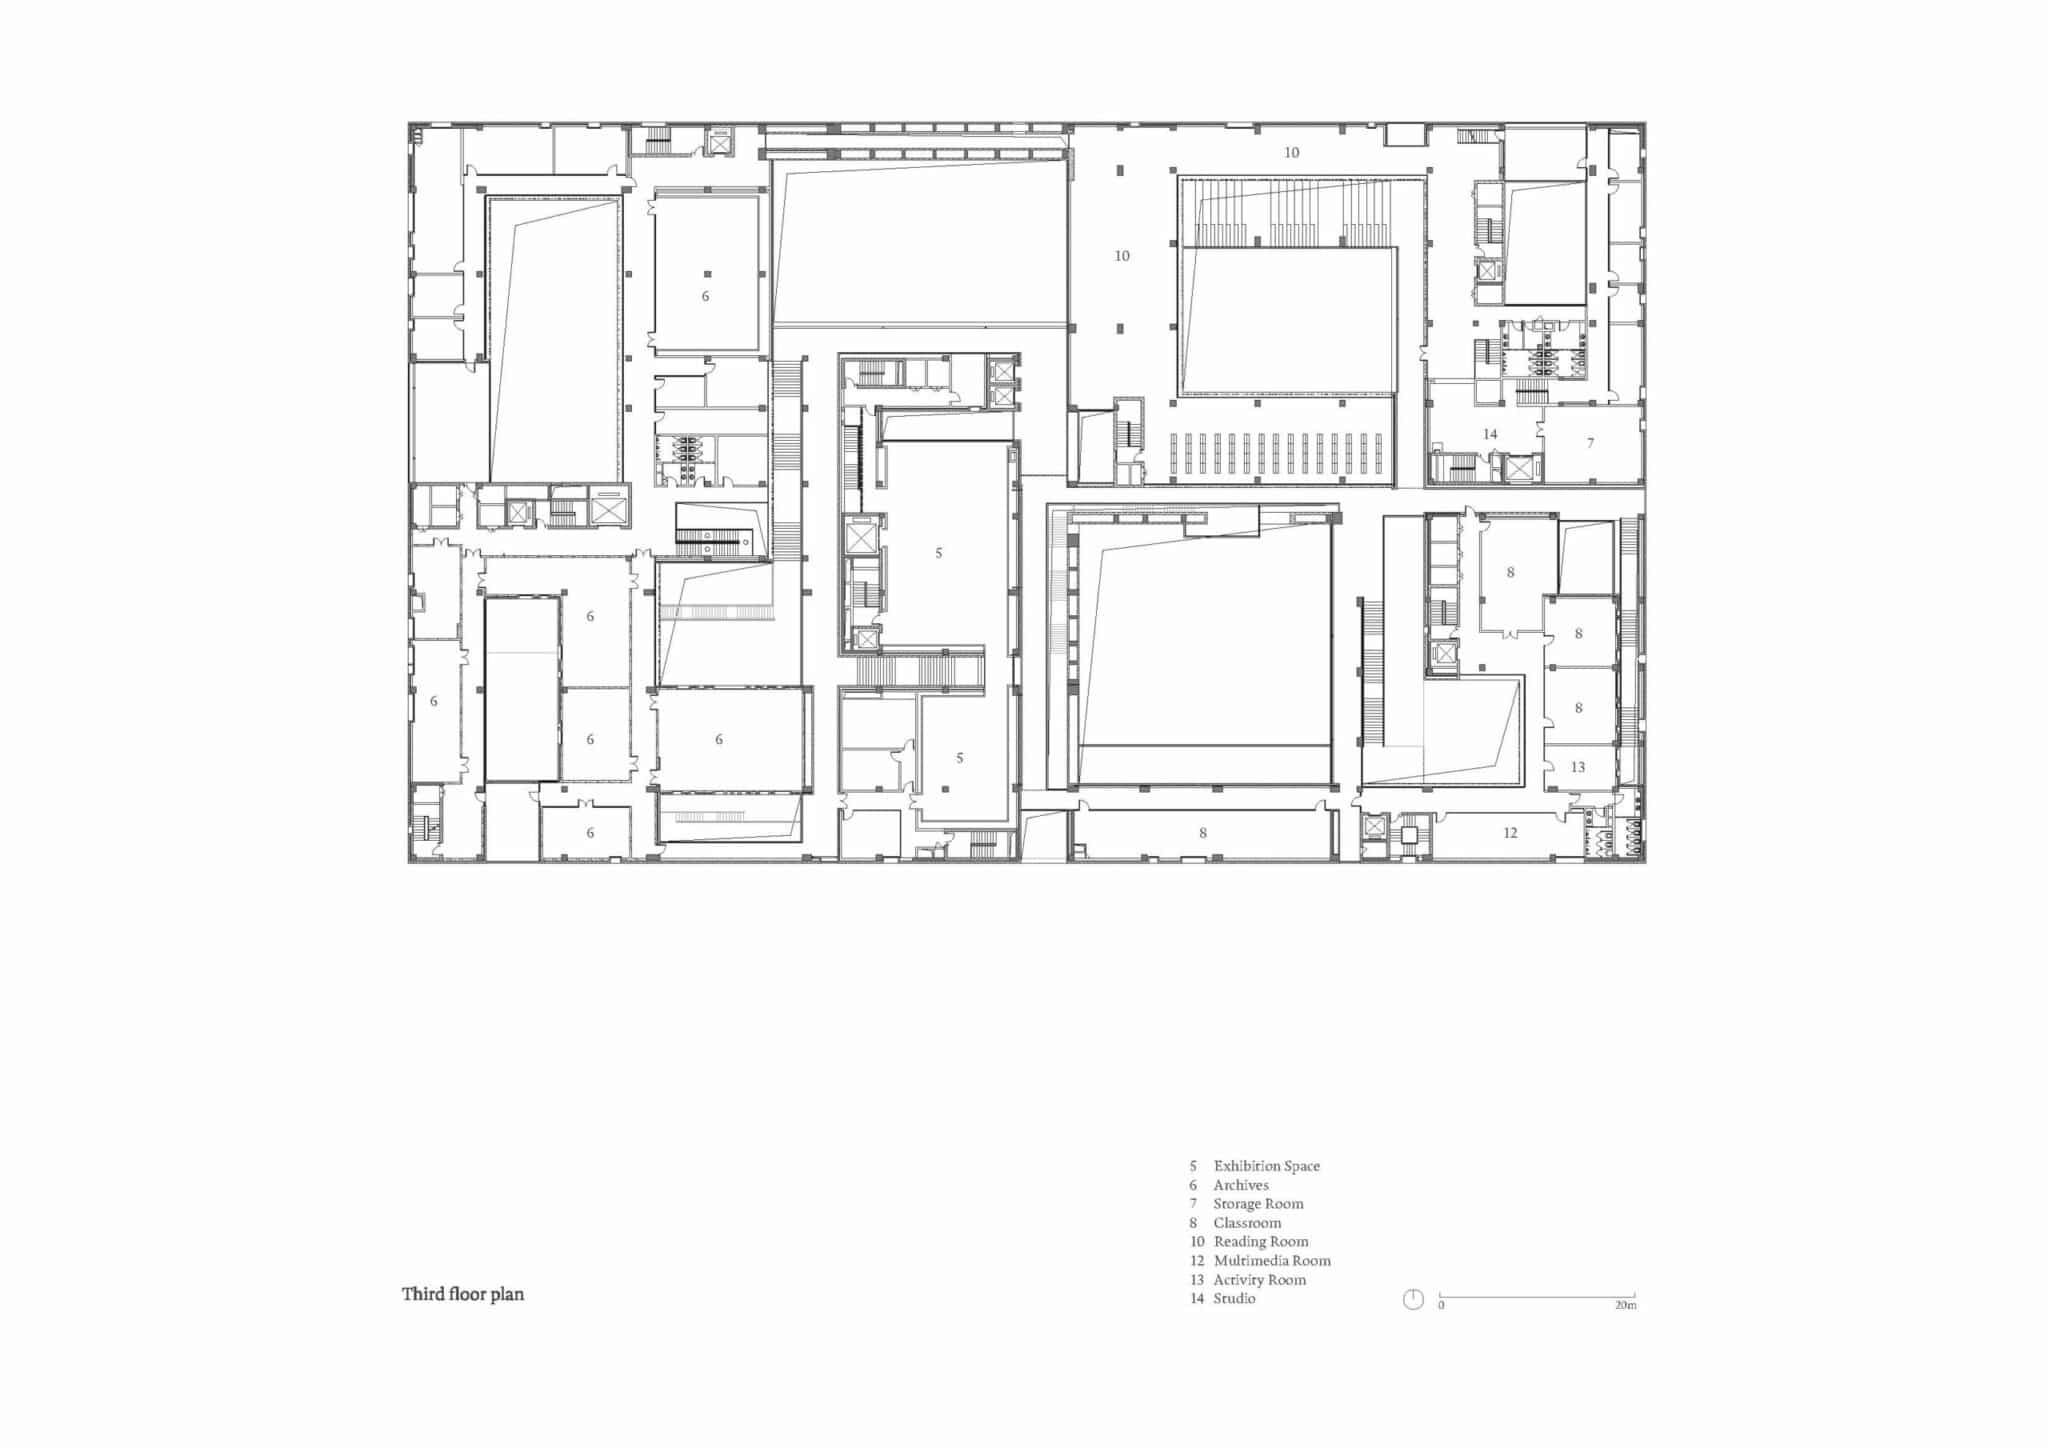 Shou County Culture and Art Center  - 20210702 Zhu Pei ShouCountyCultureArtCenter 12.2.3 scaled 65